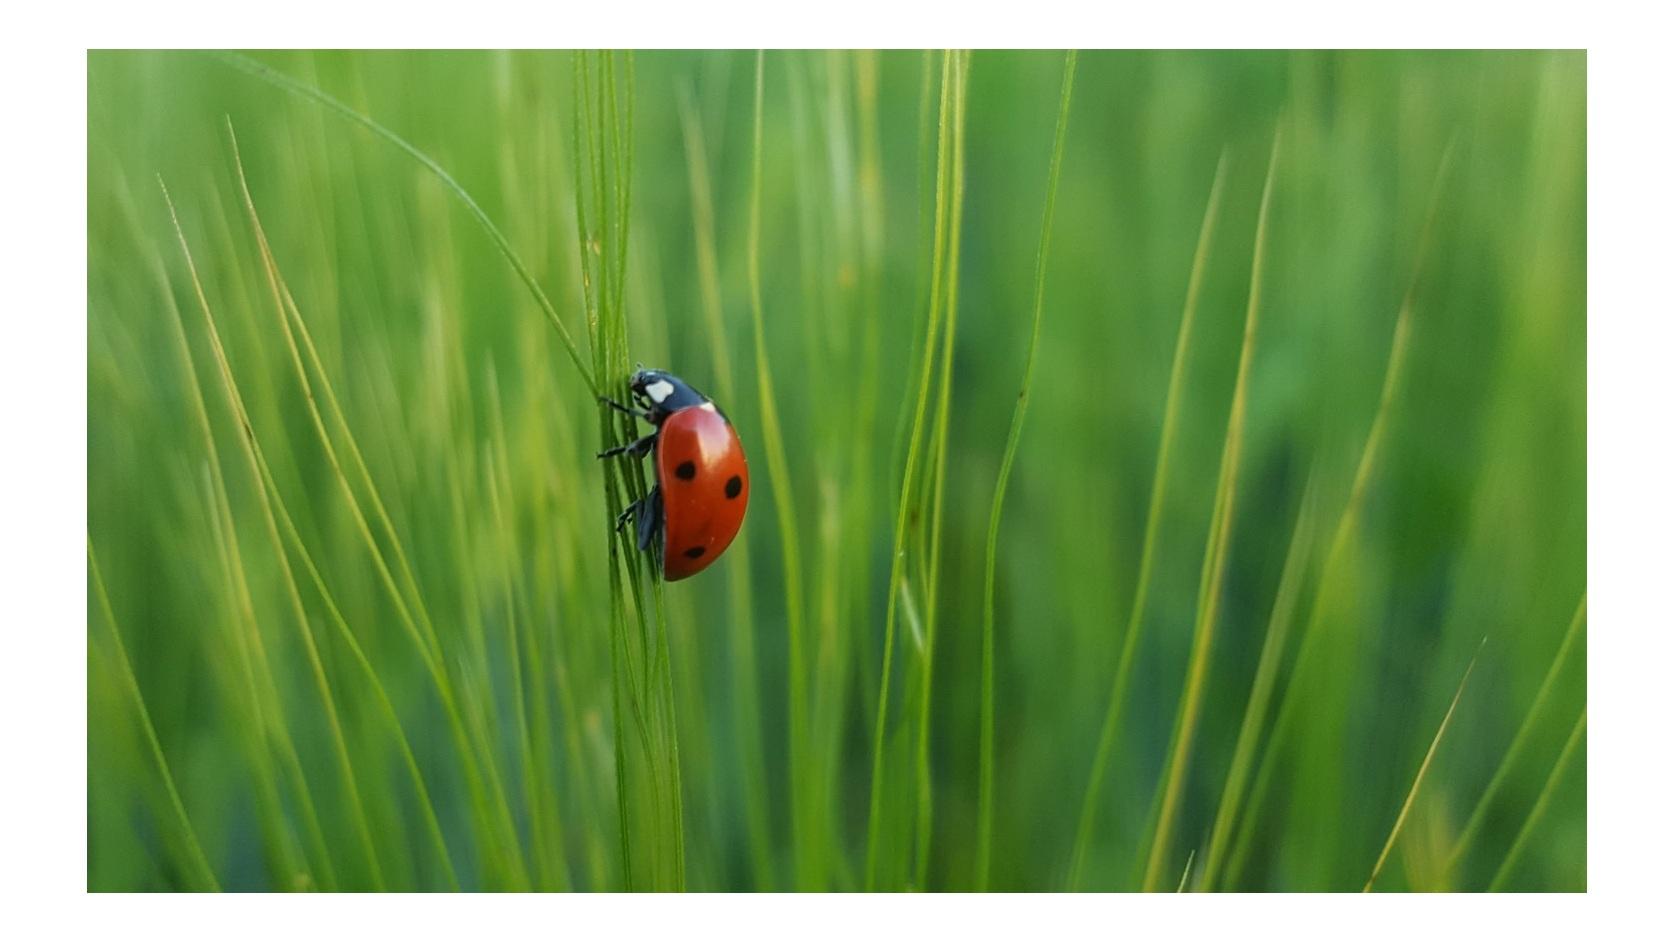 balance-by-heather-gream-ladybug-martin-oslic-Qi93Pl5vDRw-1500.jpg